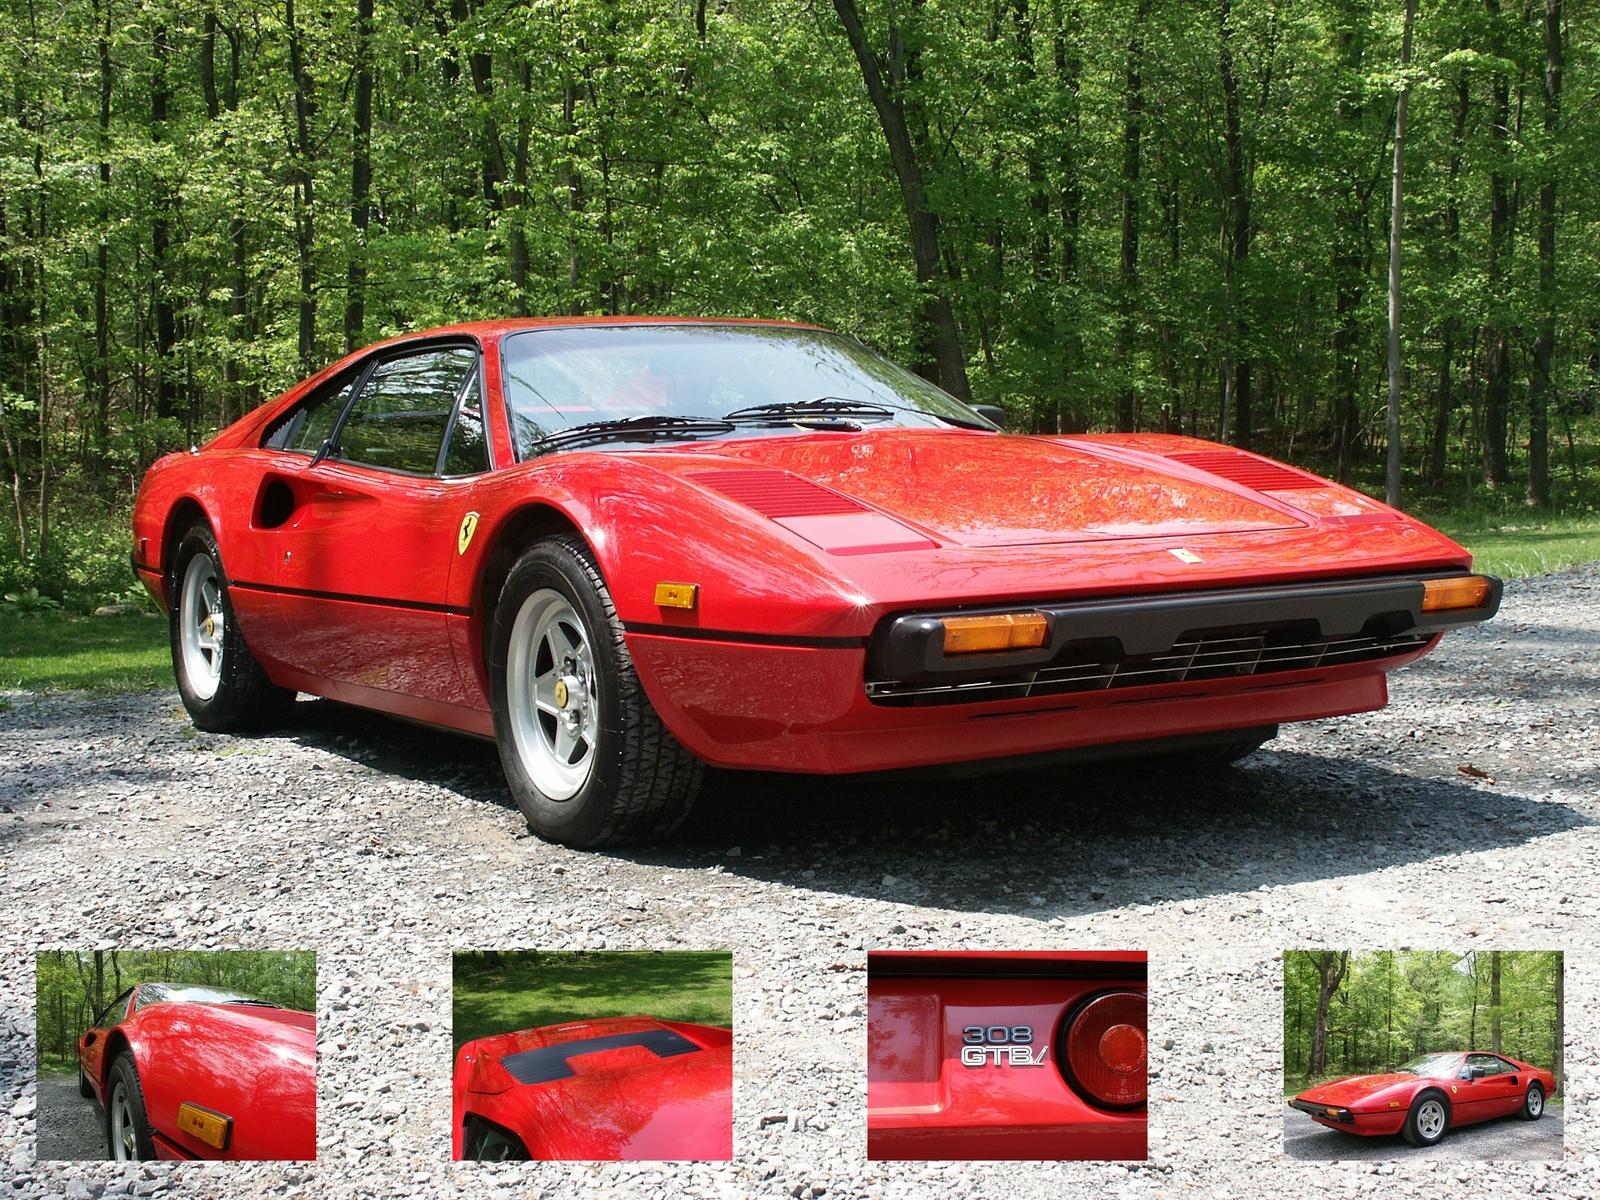 1982_ferrari_308_gtb-pic-10038 Fabulous Ferrari Mondial 8 Super Elite Cars Trend